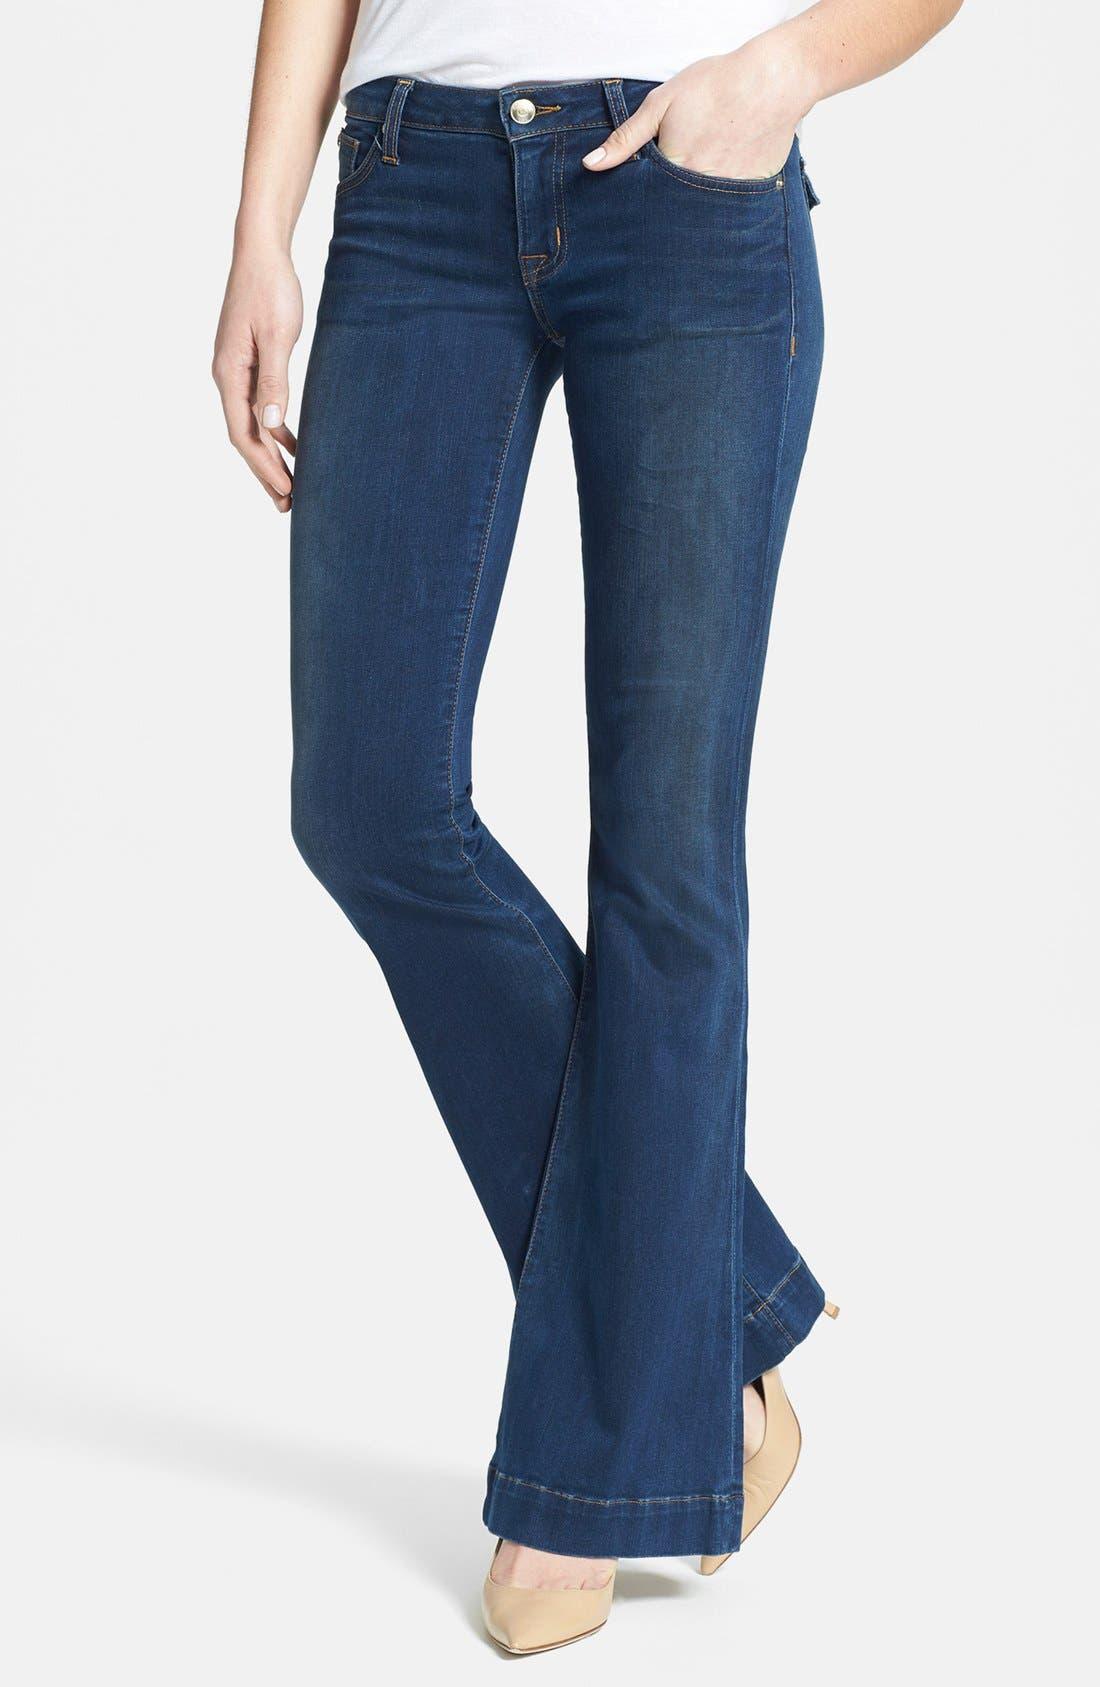 Main Image - Hudson Jeans 'Ferris' Flare Leg Jeans (Wanderlust)